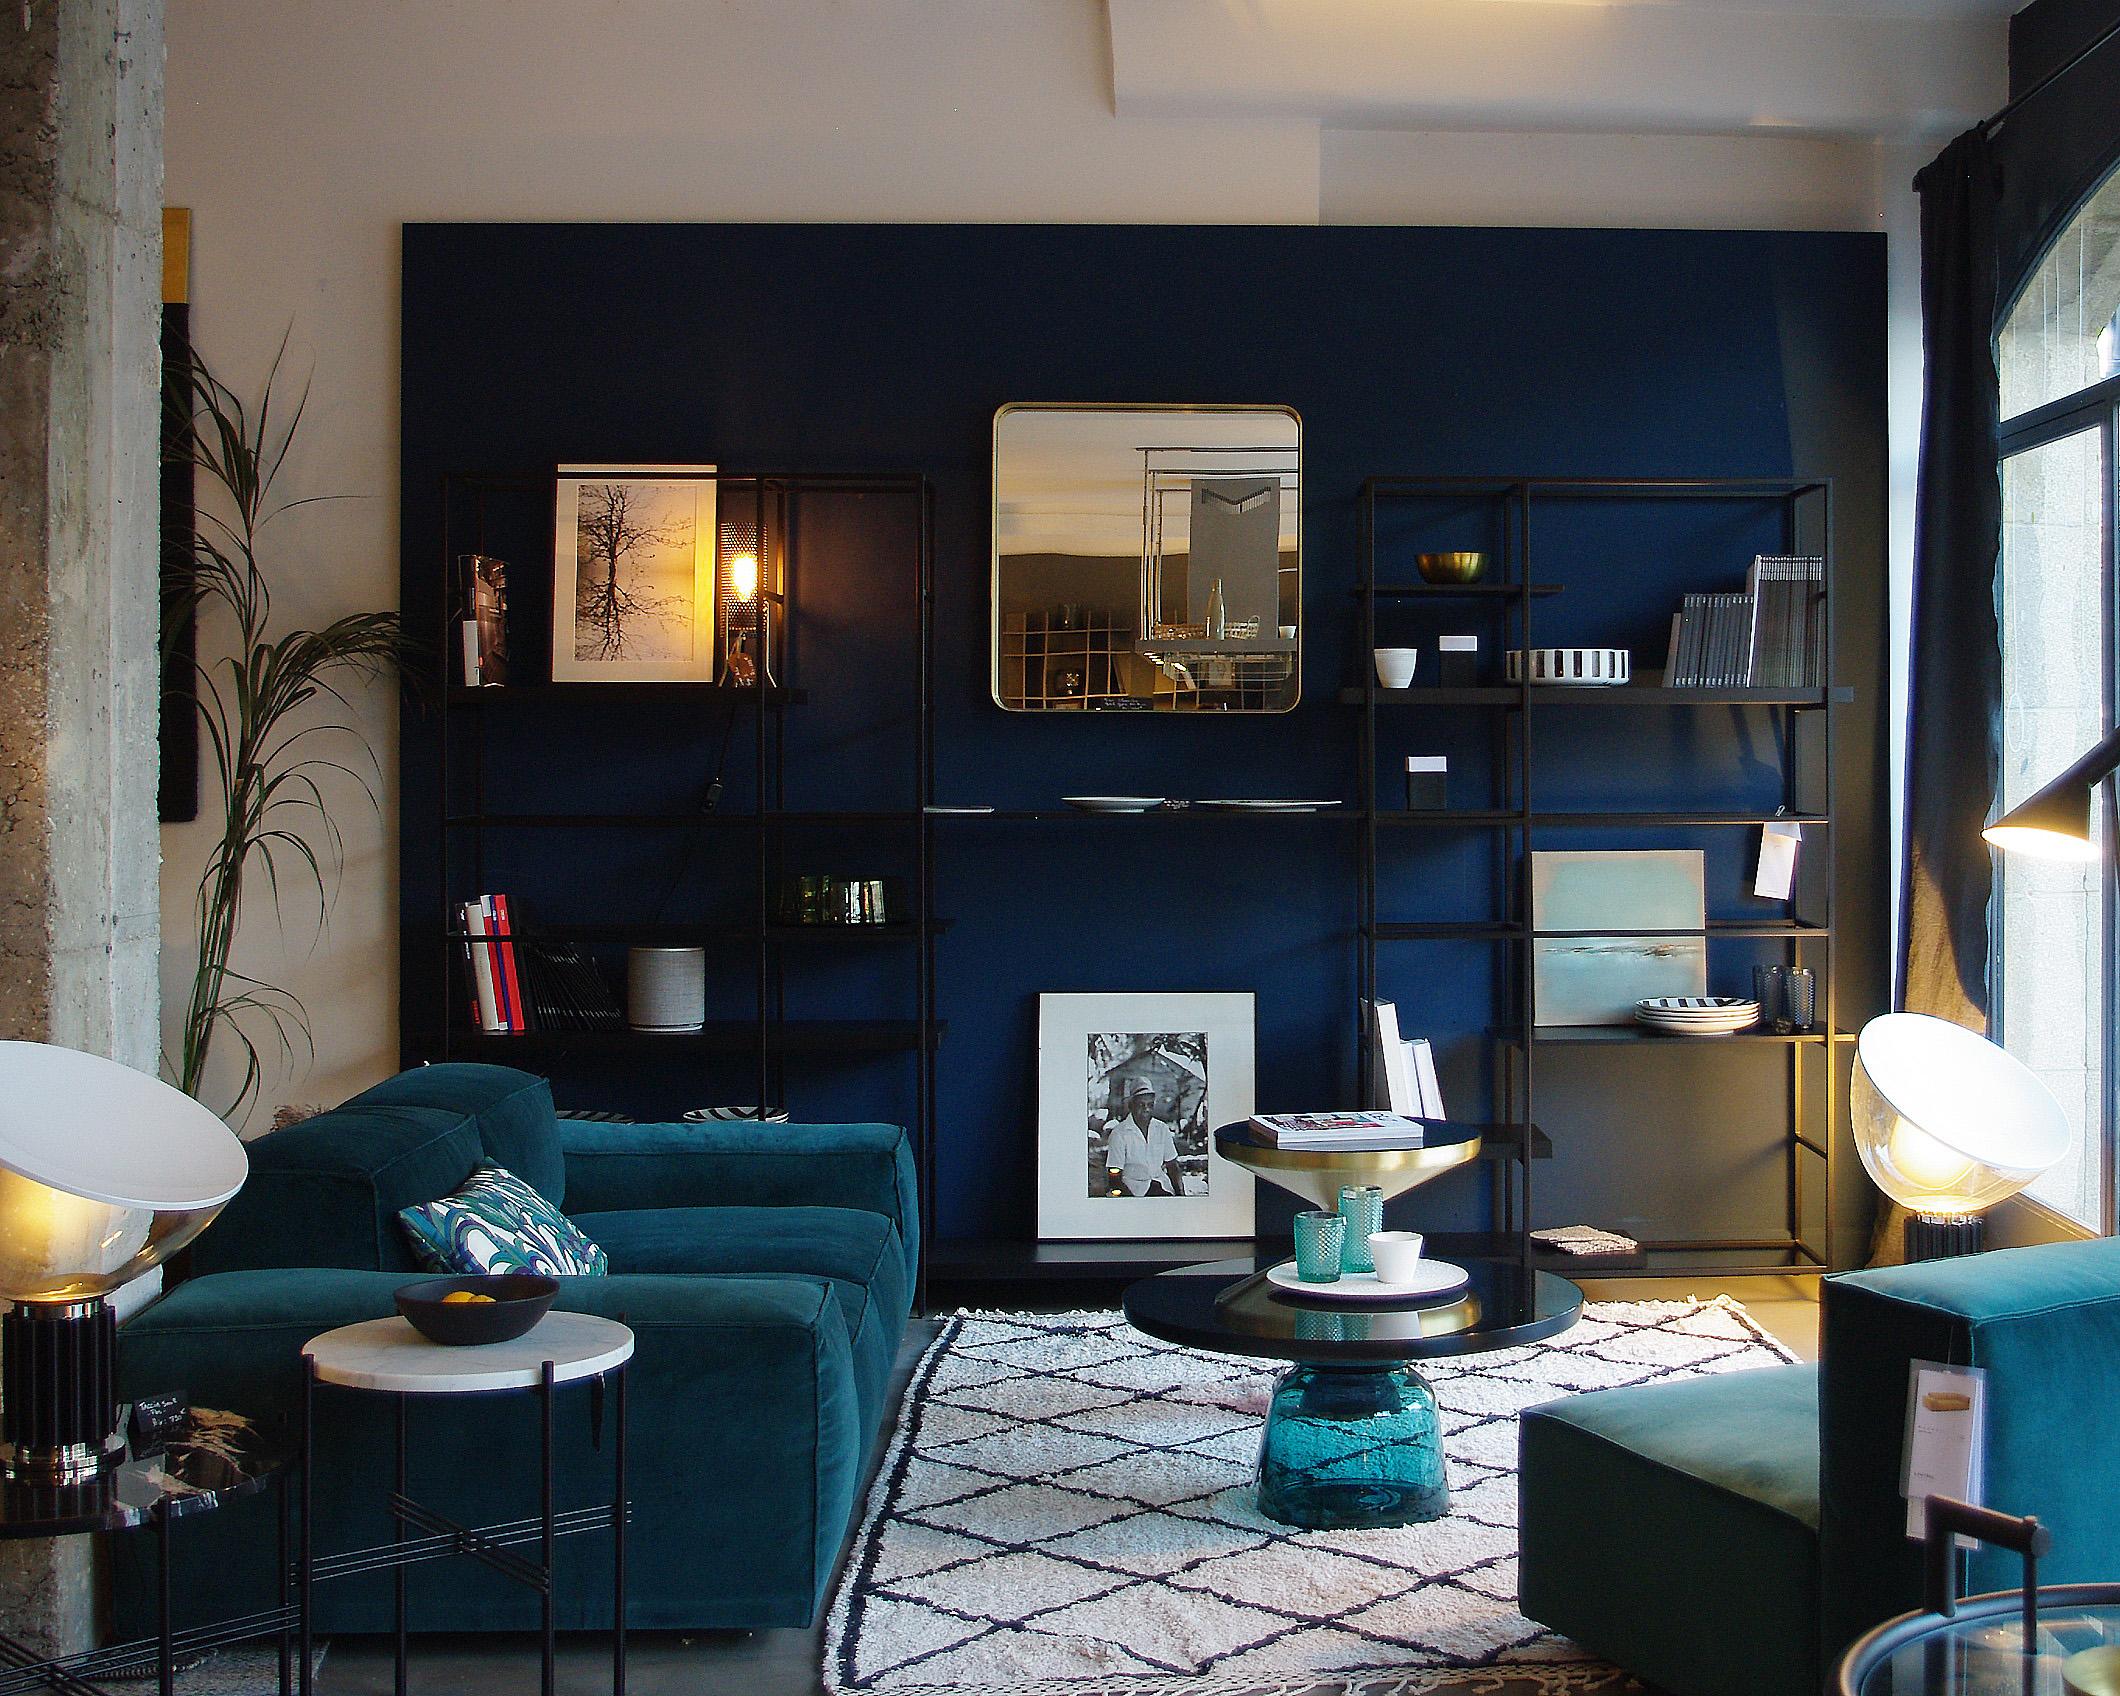 https://amelie-bouchez.fr/wp-content/uploads/2020/11/amelie-bouchez-showroom-decoration-stremydeprovence-5.jpg